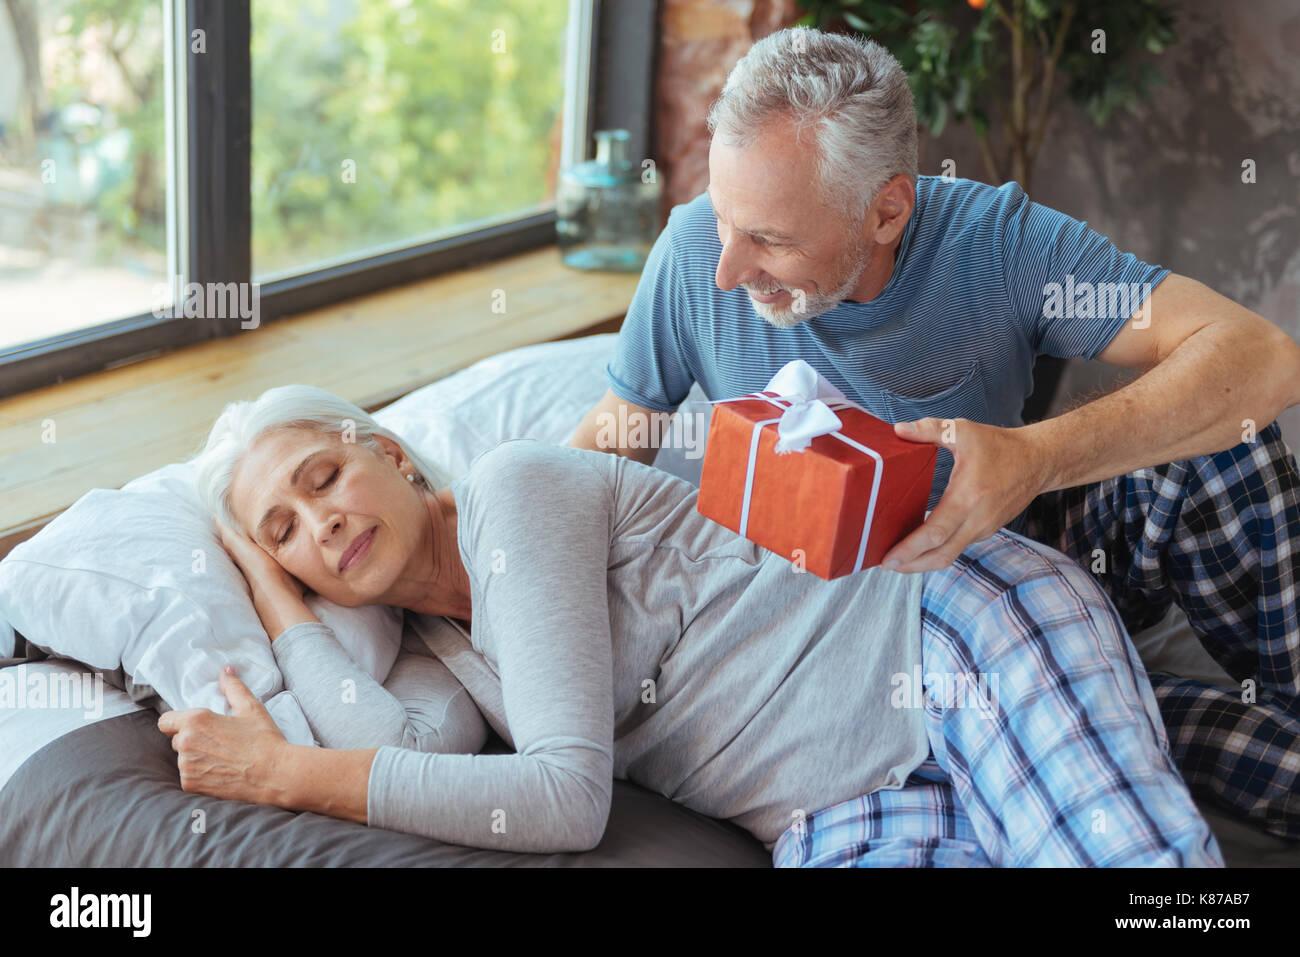 Cheerful Elderly Man Preparing A Birthday Present For His Wife